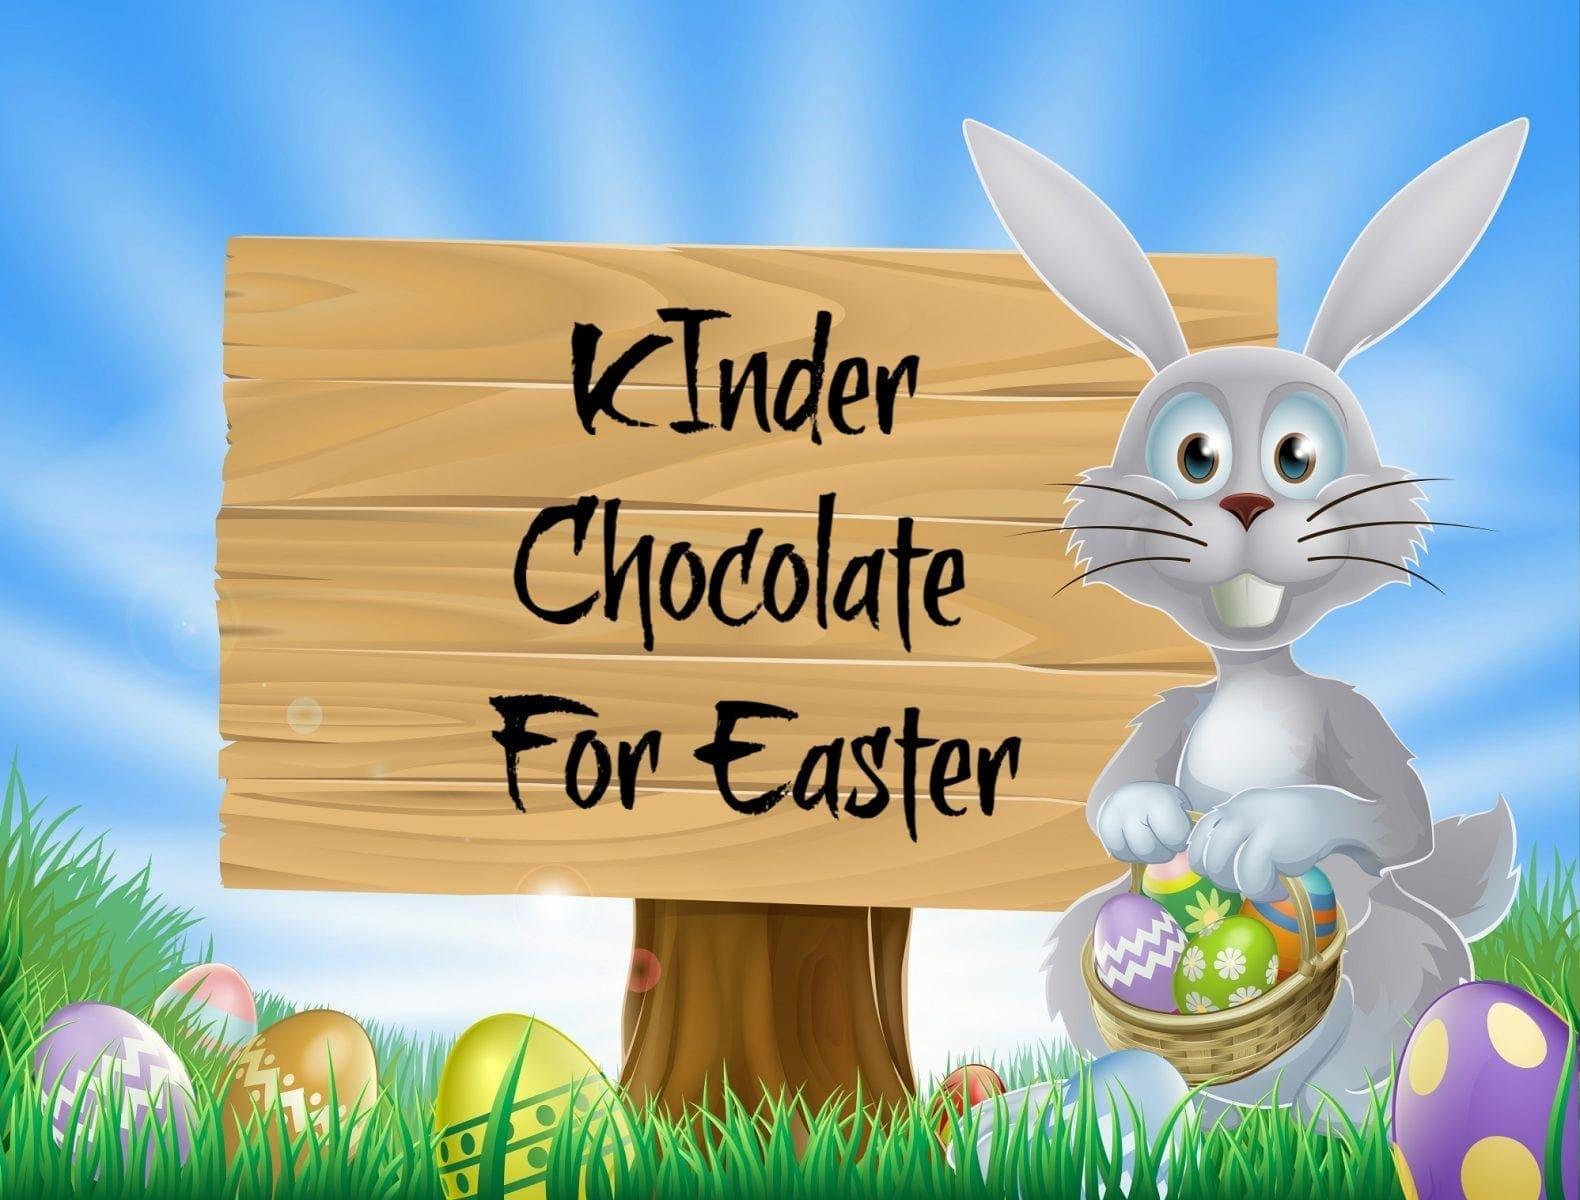 Kinder for Easter- Fill the Easter Basket with Kinder Chocolate